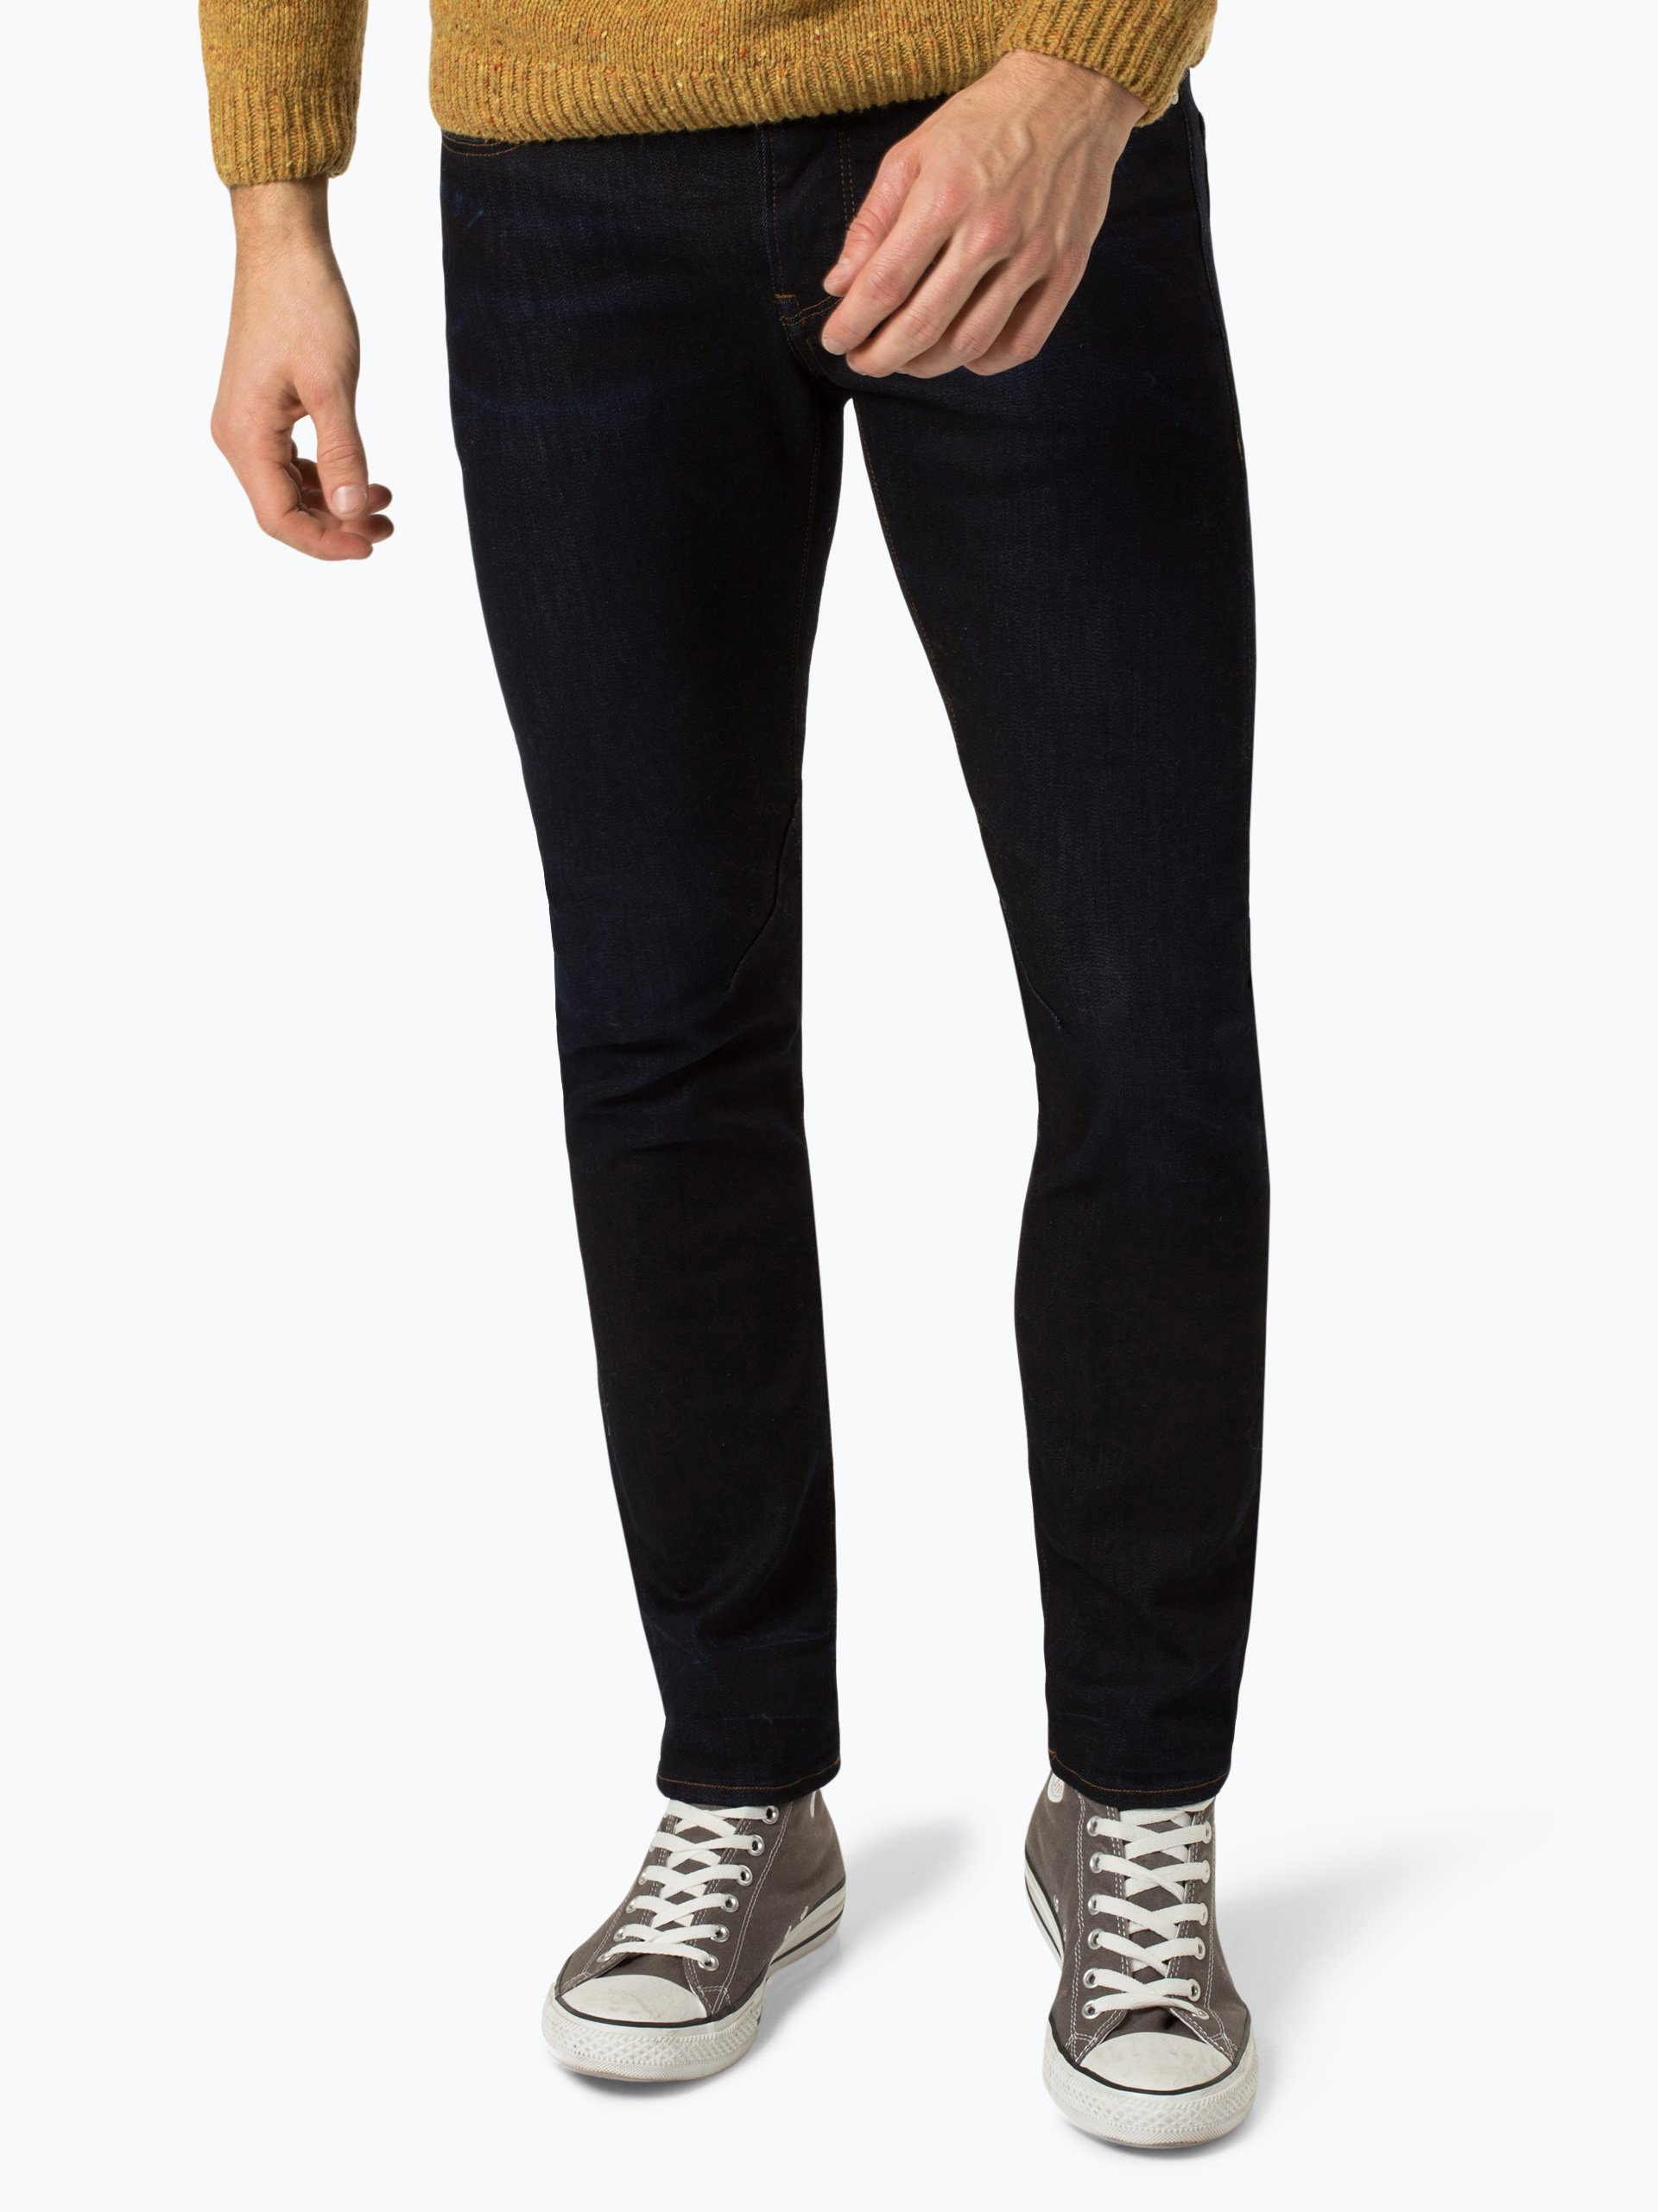 G-Star RAW Herren Jeans - D-Staq